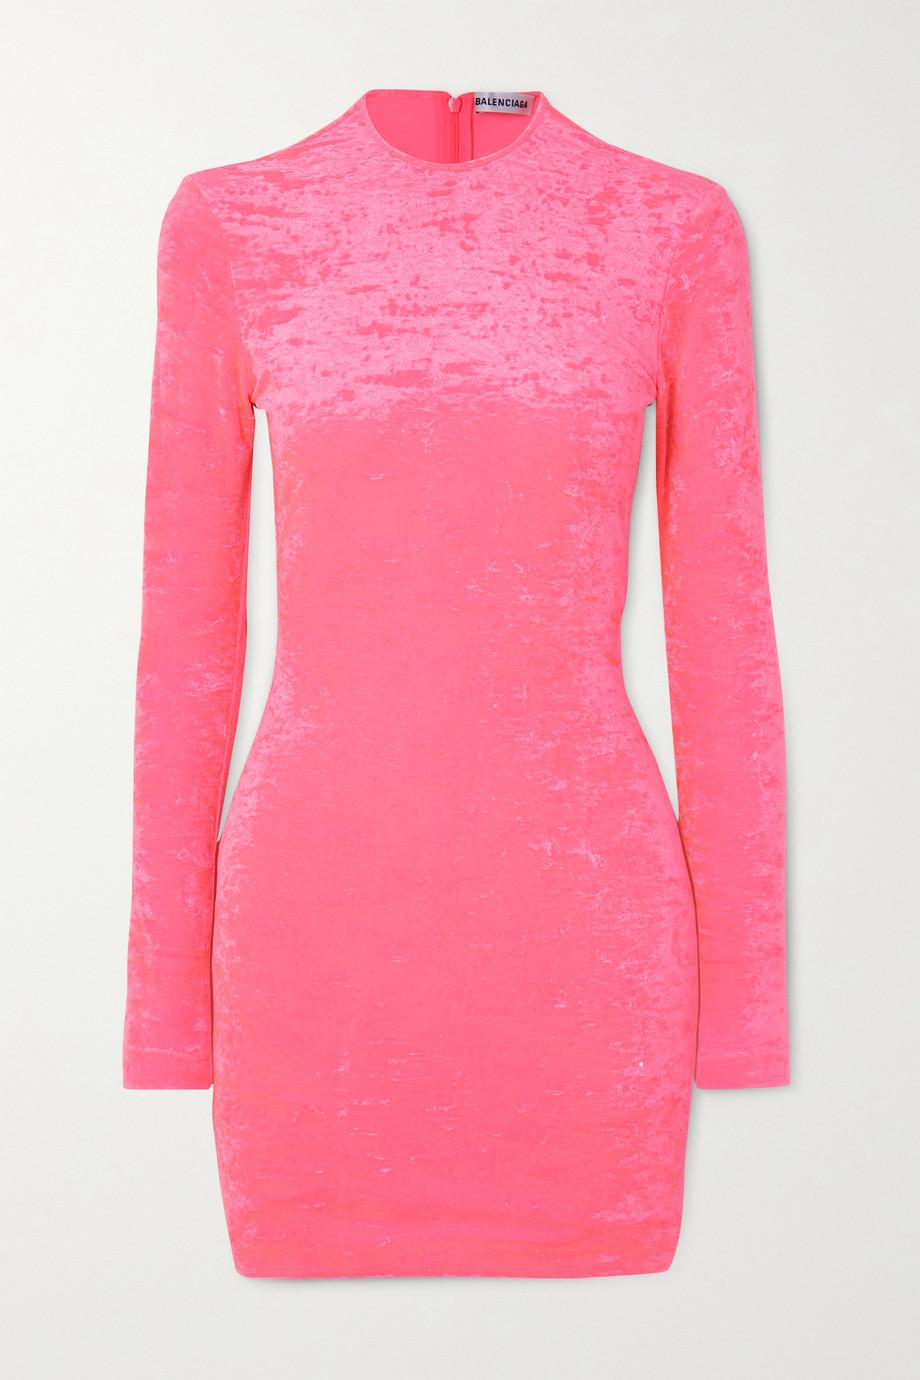 Balenciaga Stretch crushed-velvet mini dress